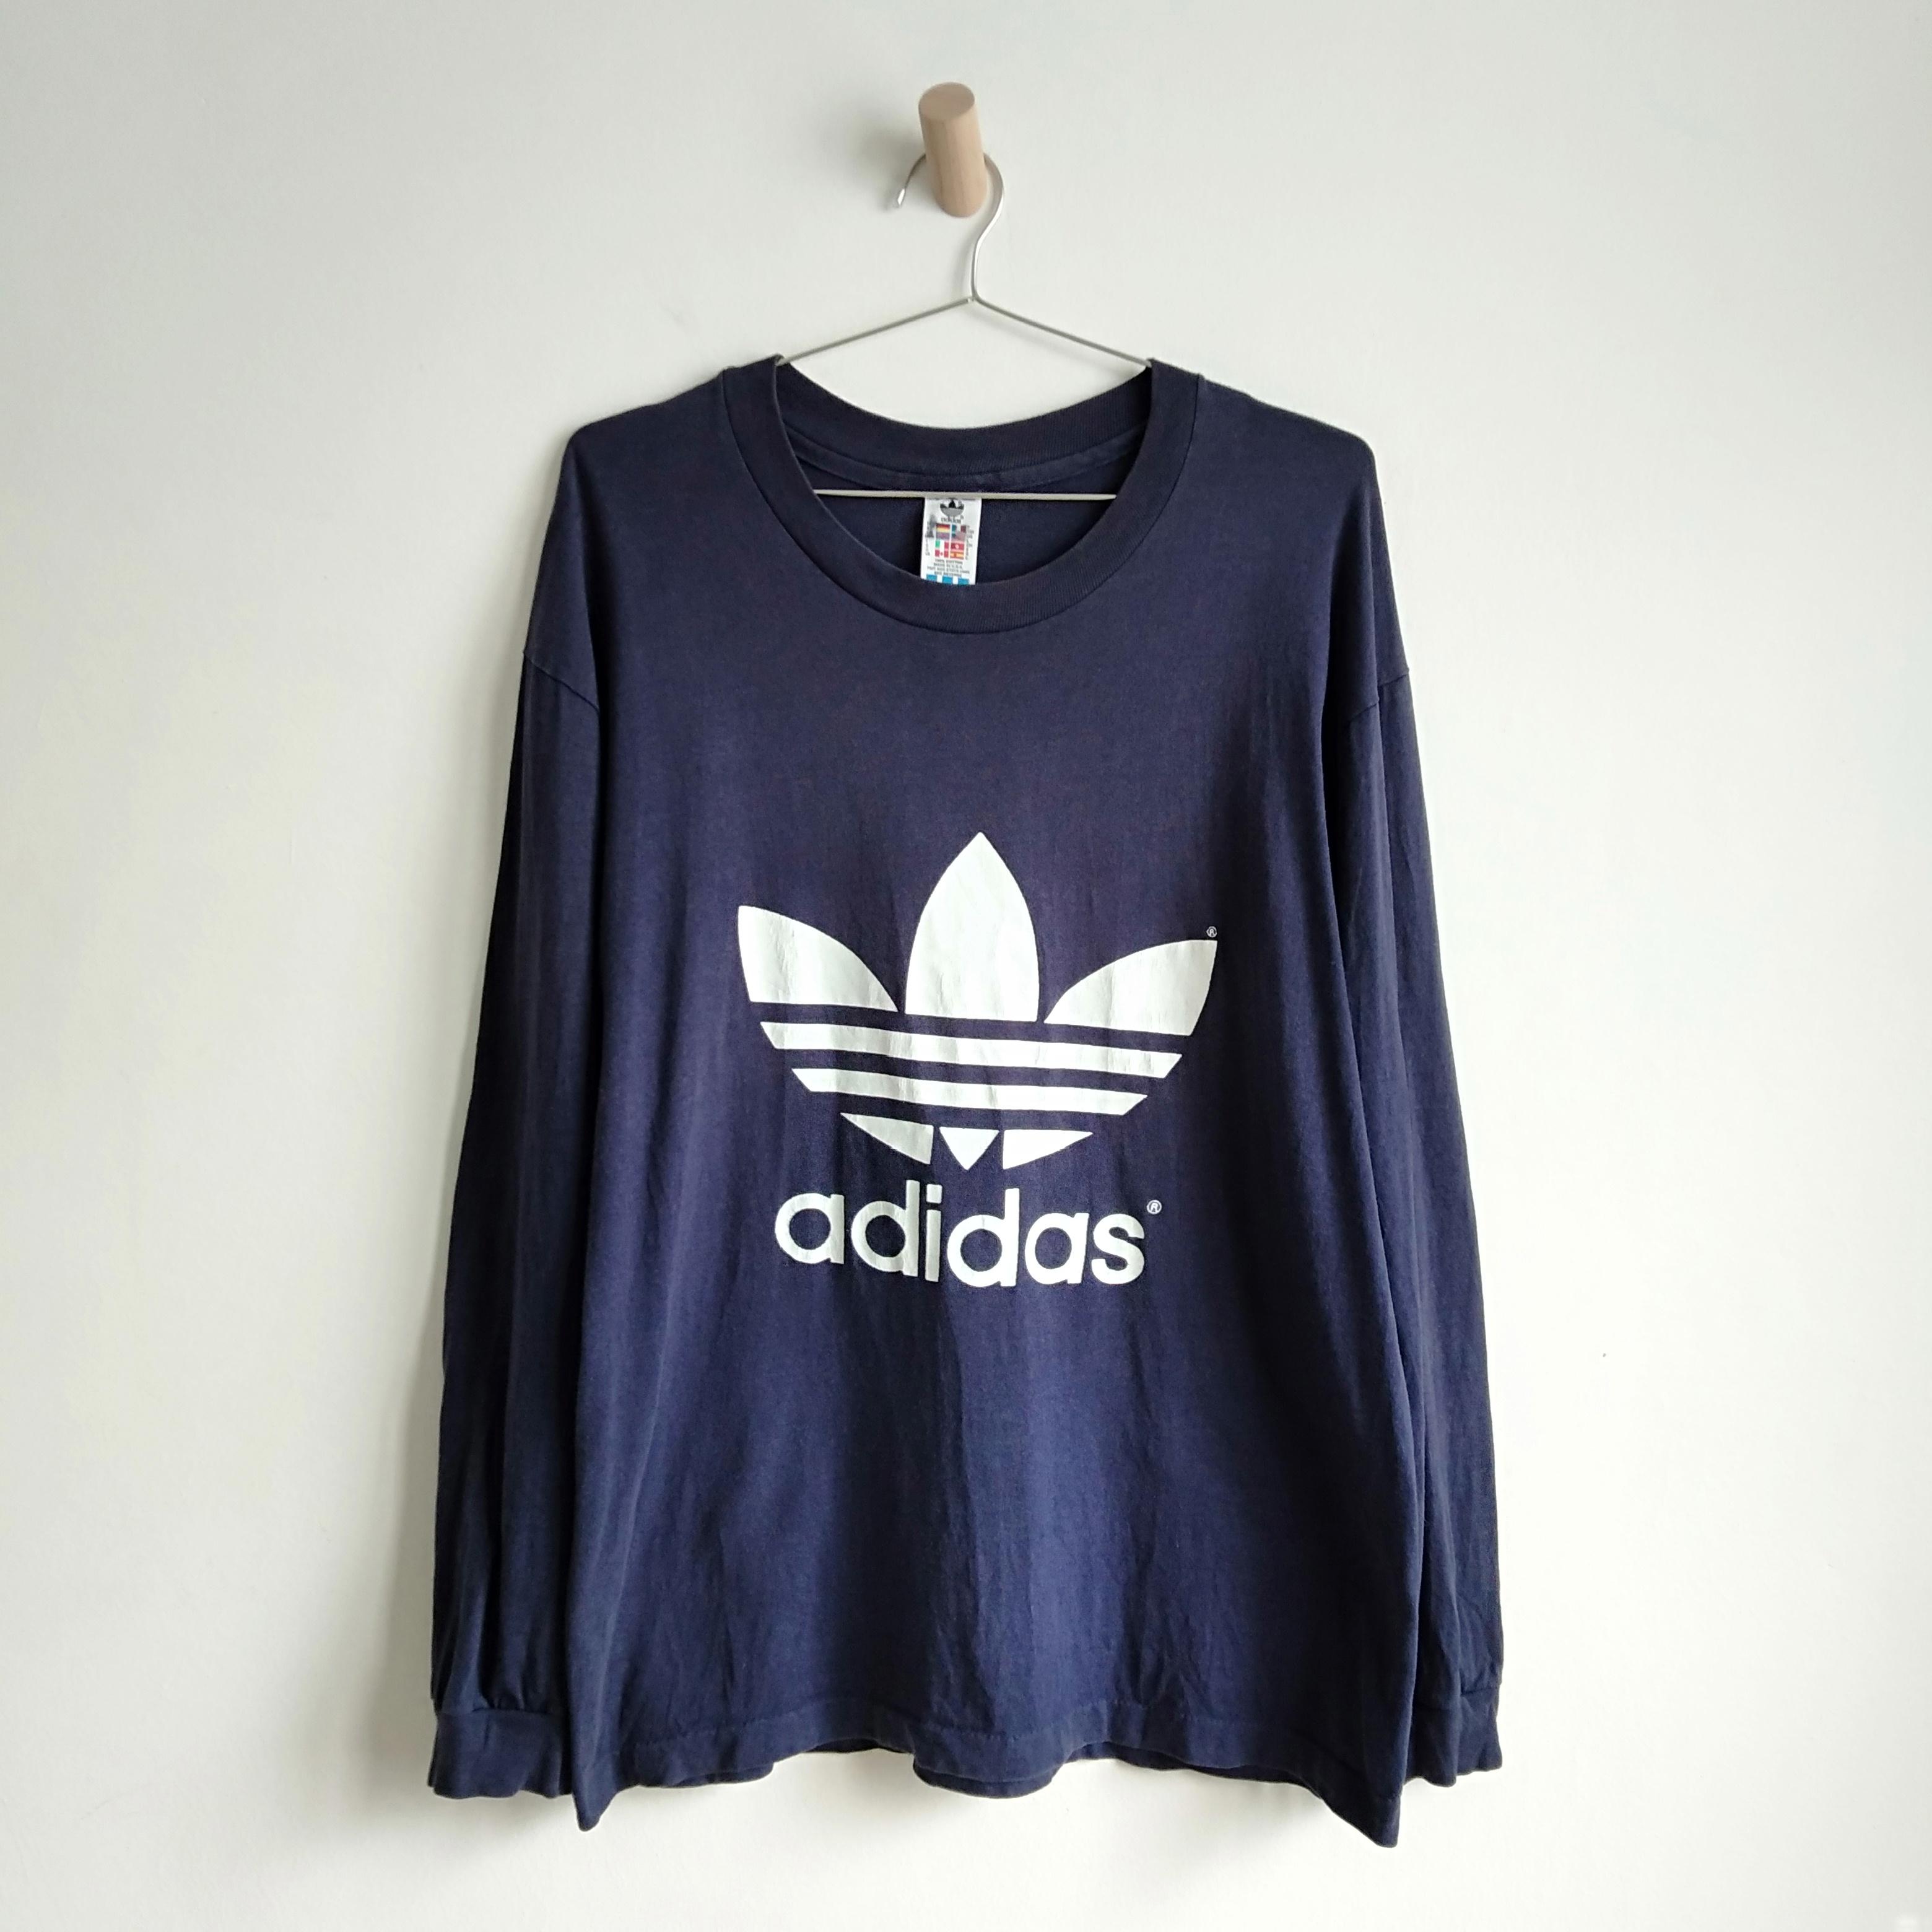 adidas sportswear usa